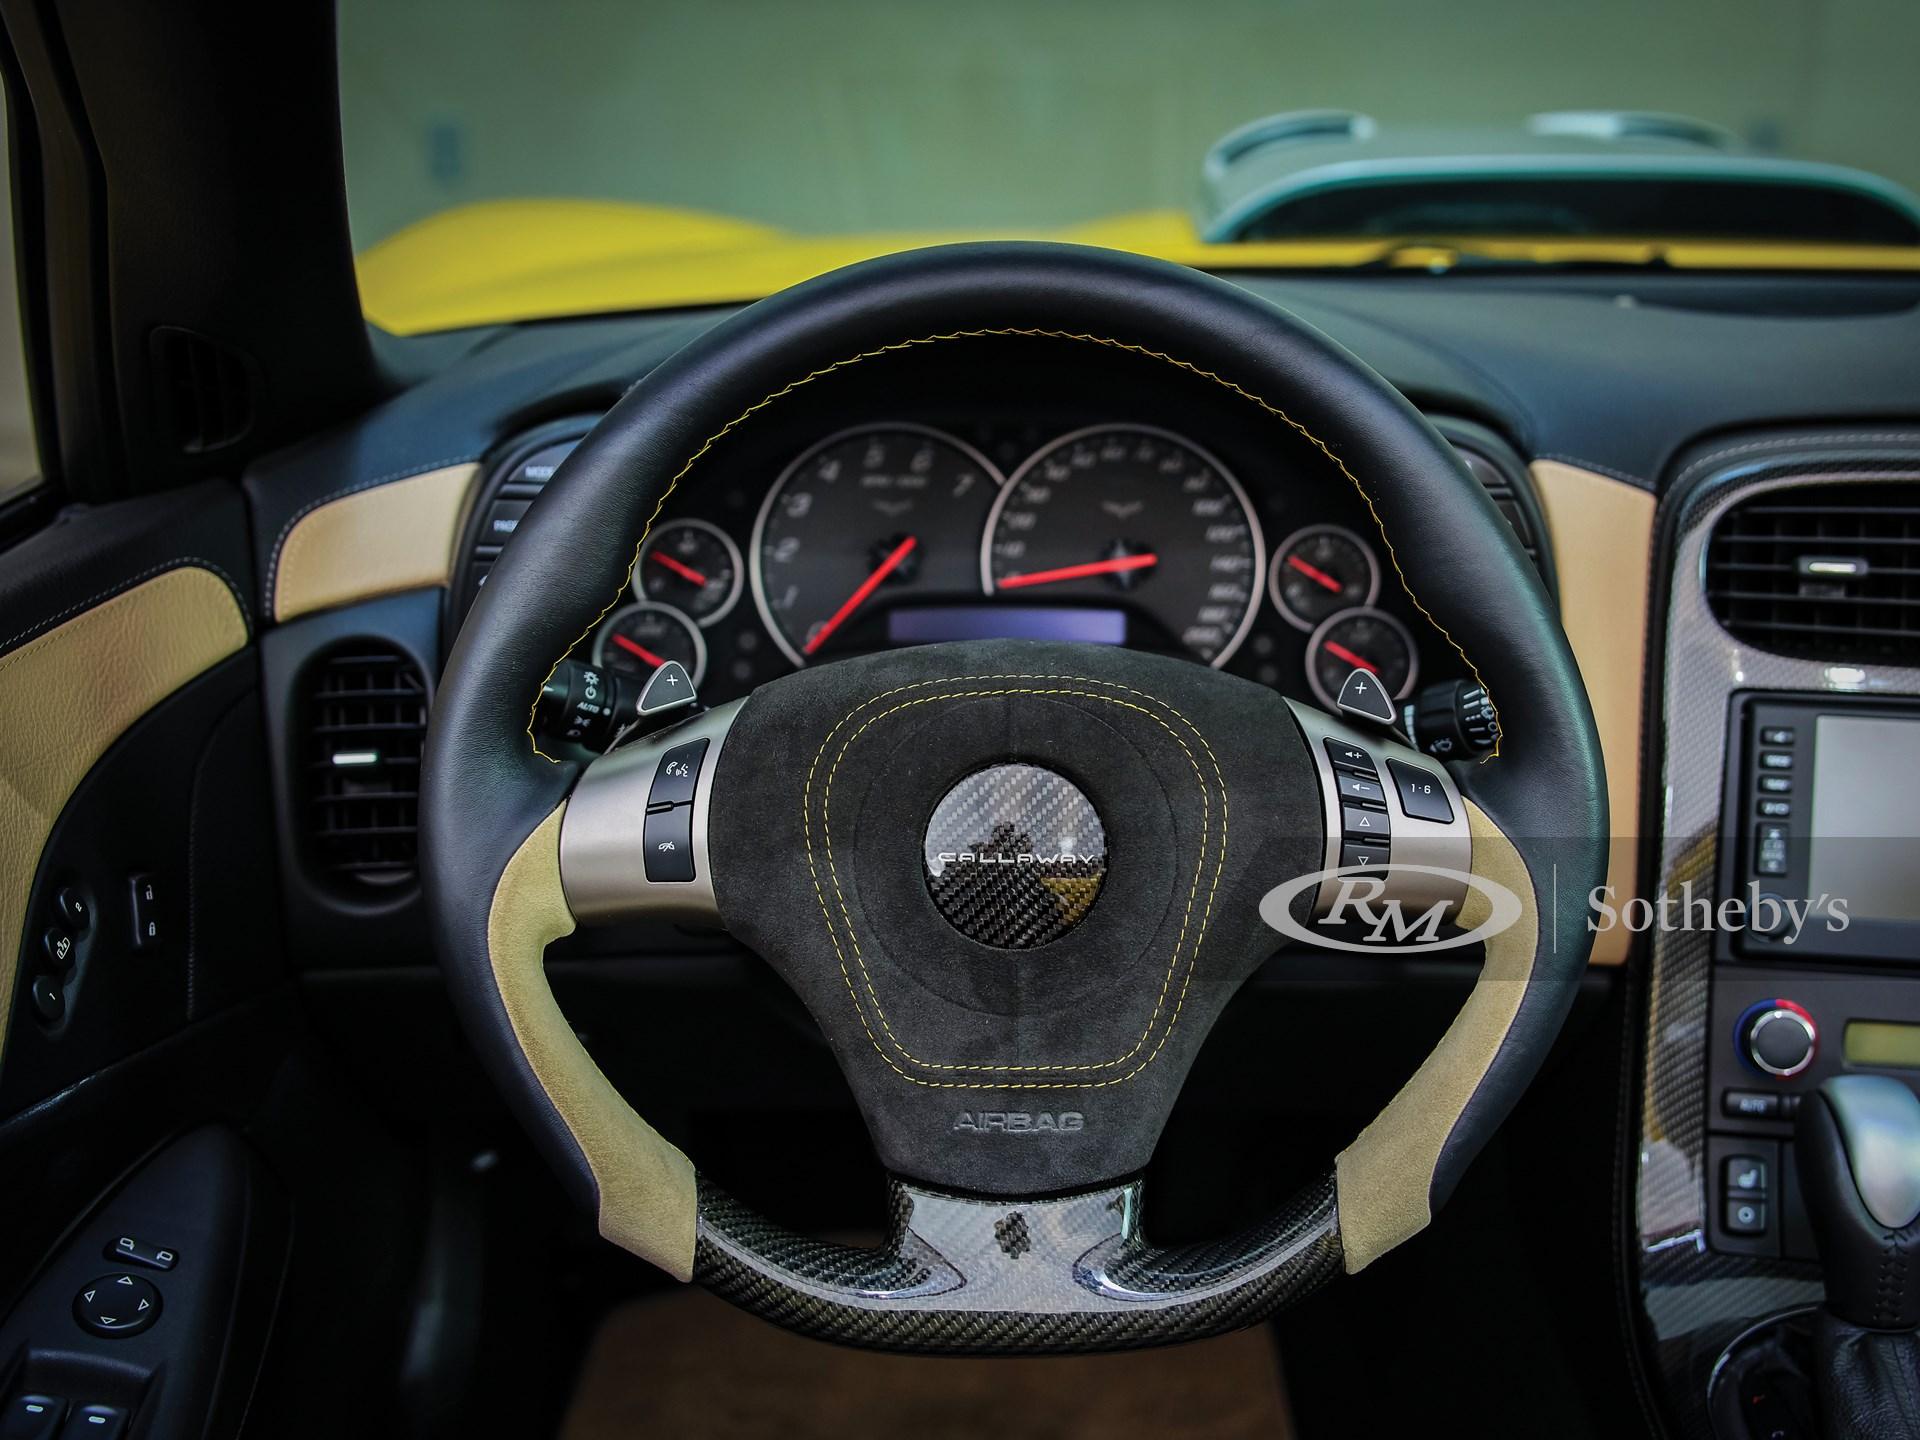 2010 Chevrolet Callaway Corvette SC606  -